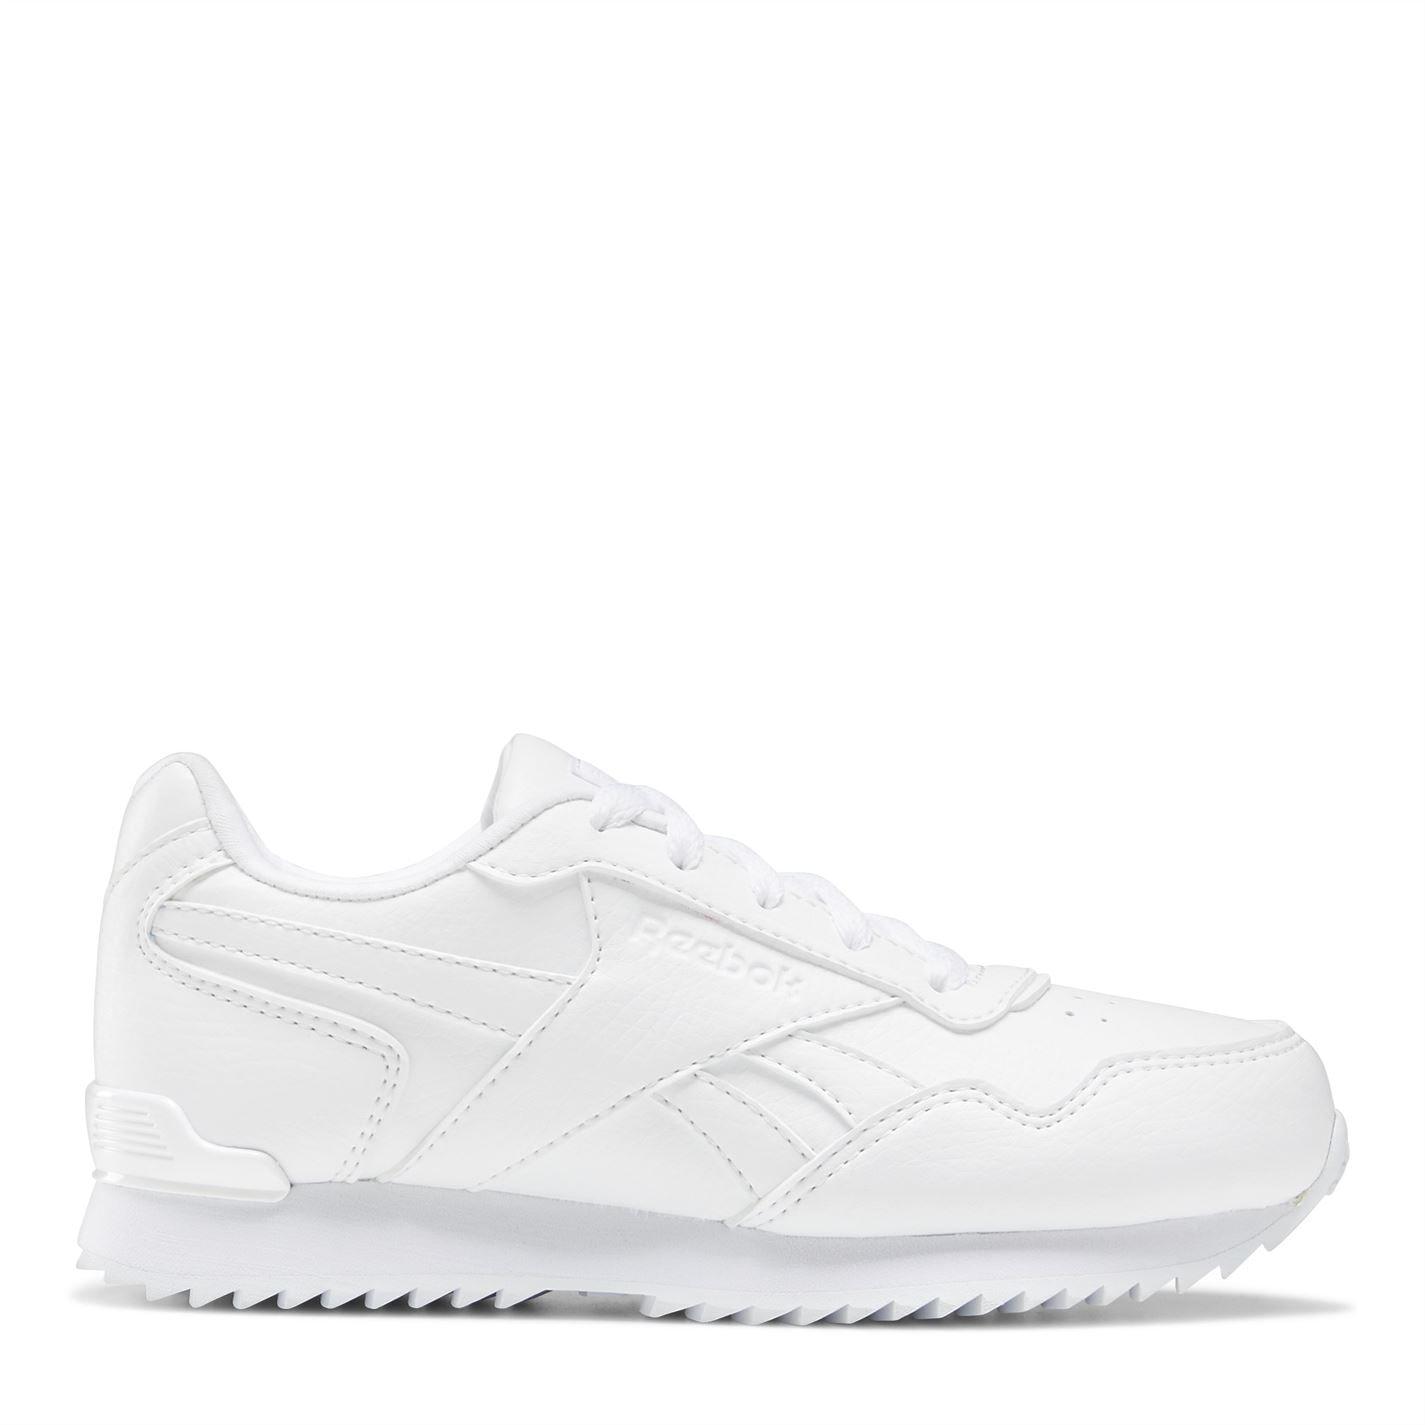 Reebok Royal Glide Ripple Clip Boys Shoes White